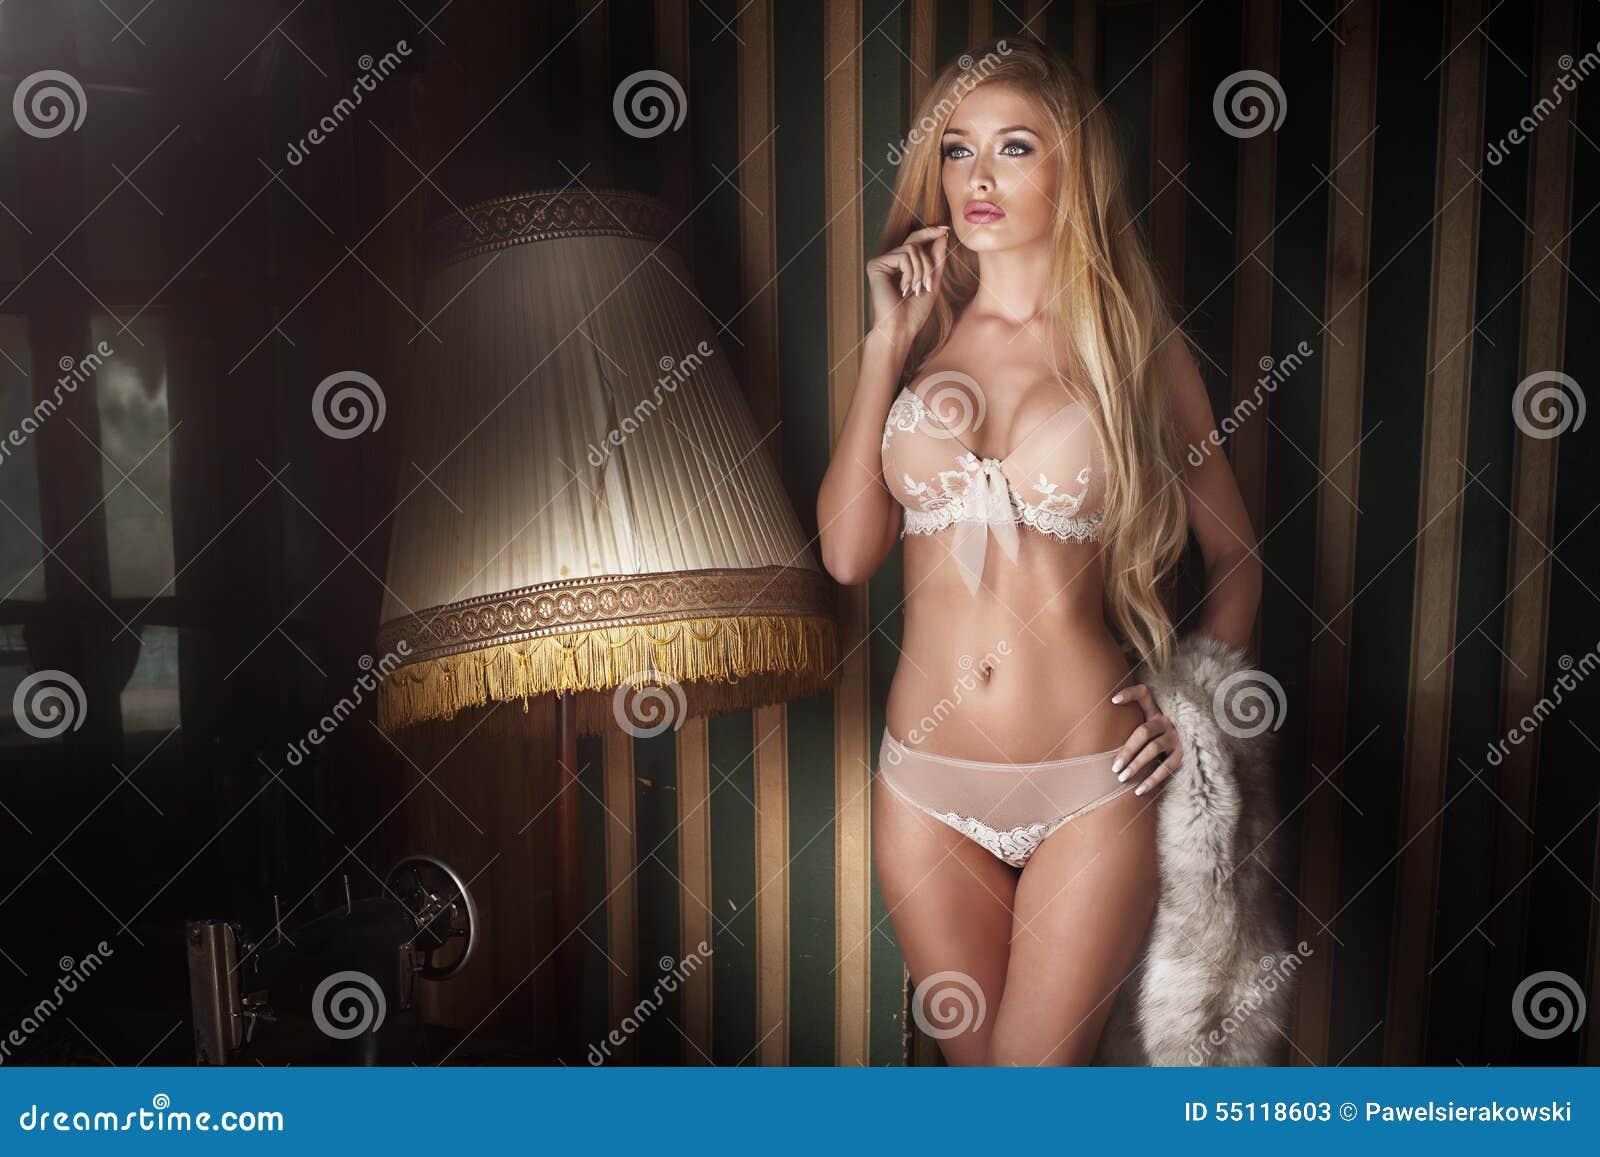 masturbation woman orgasam